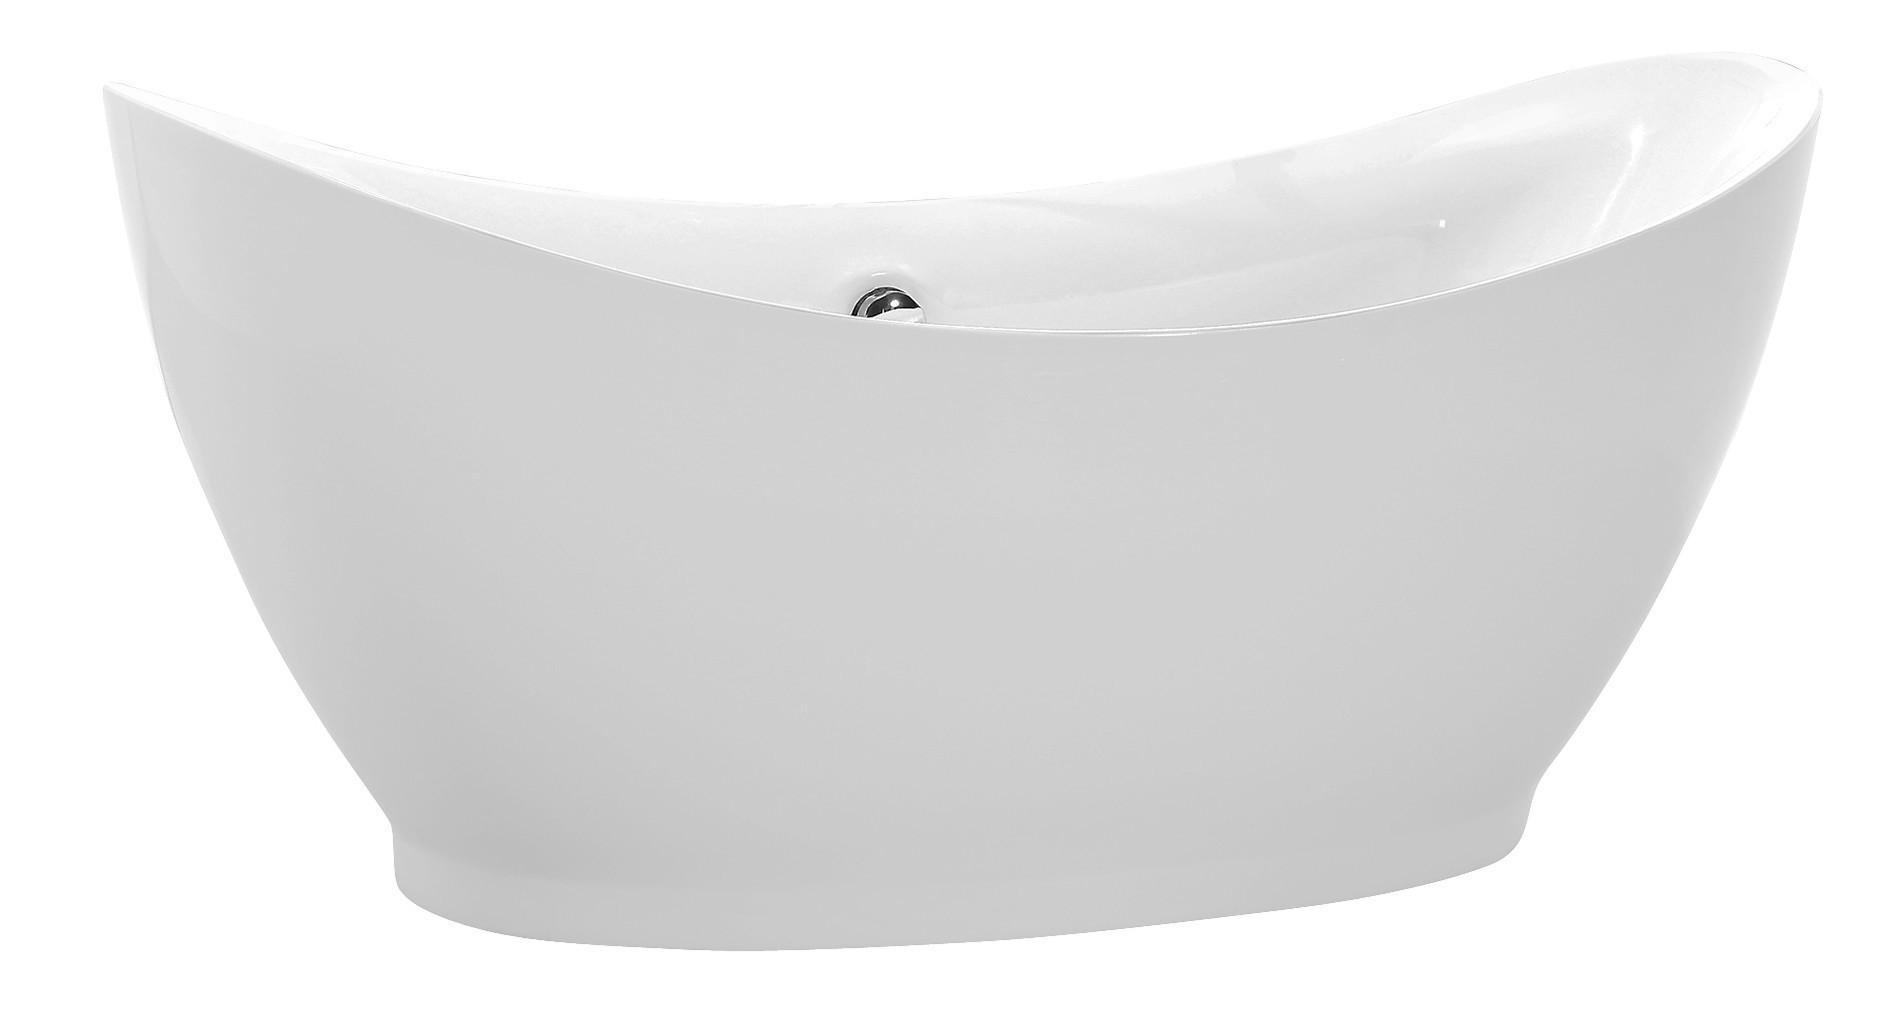 Anzzi FT-AZ091 Reginald Series 5.67 ft. Freestanding Bathtub in White